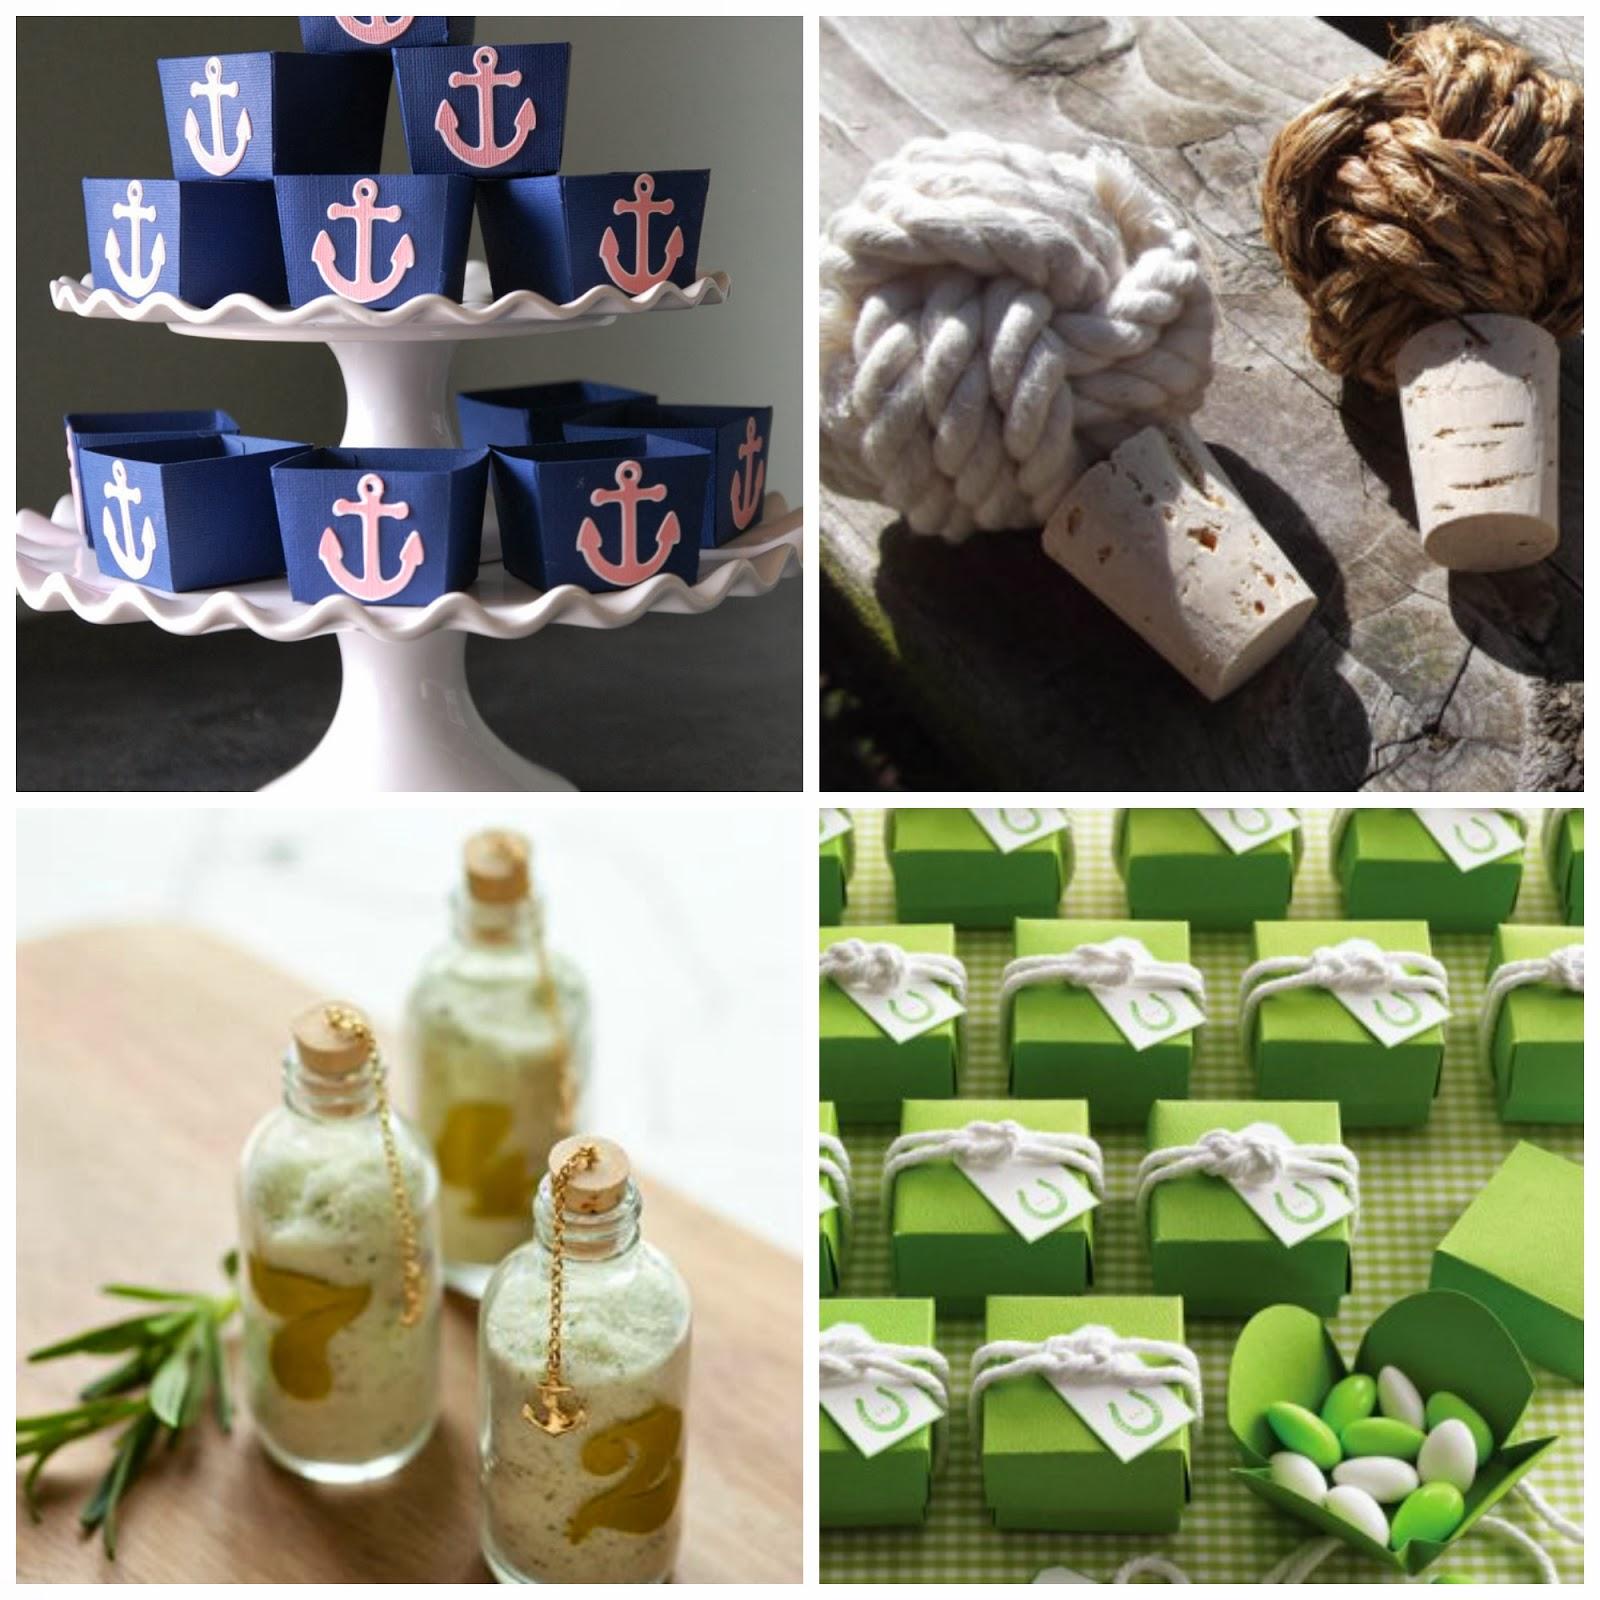 A Bride's BFF: Nautical Wedding Favor Ideas